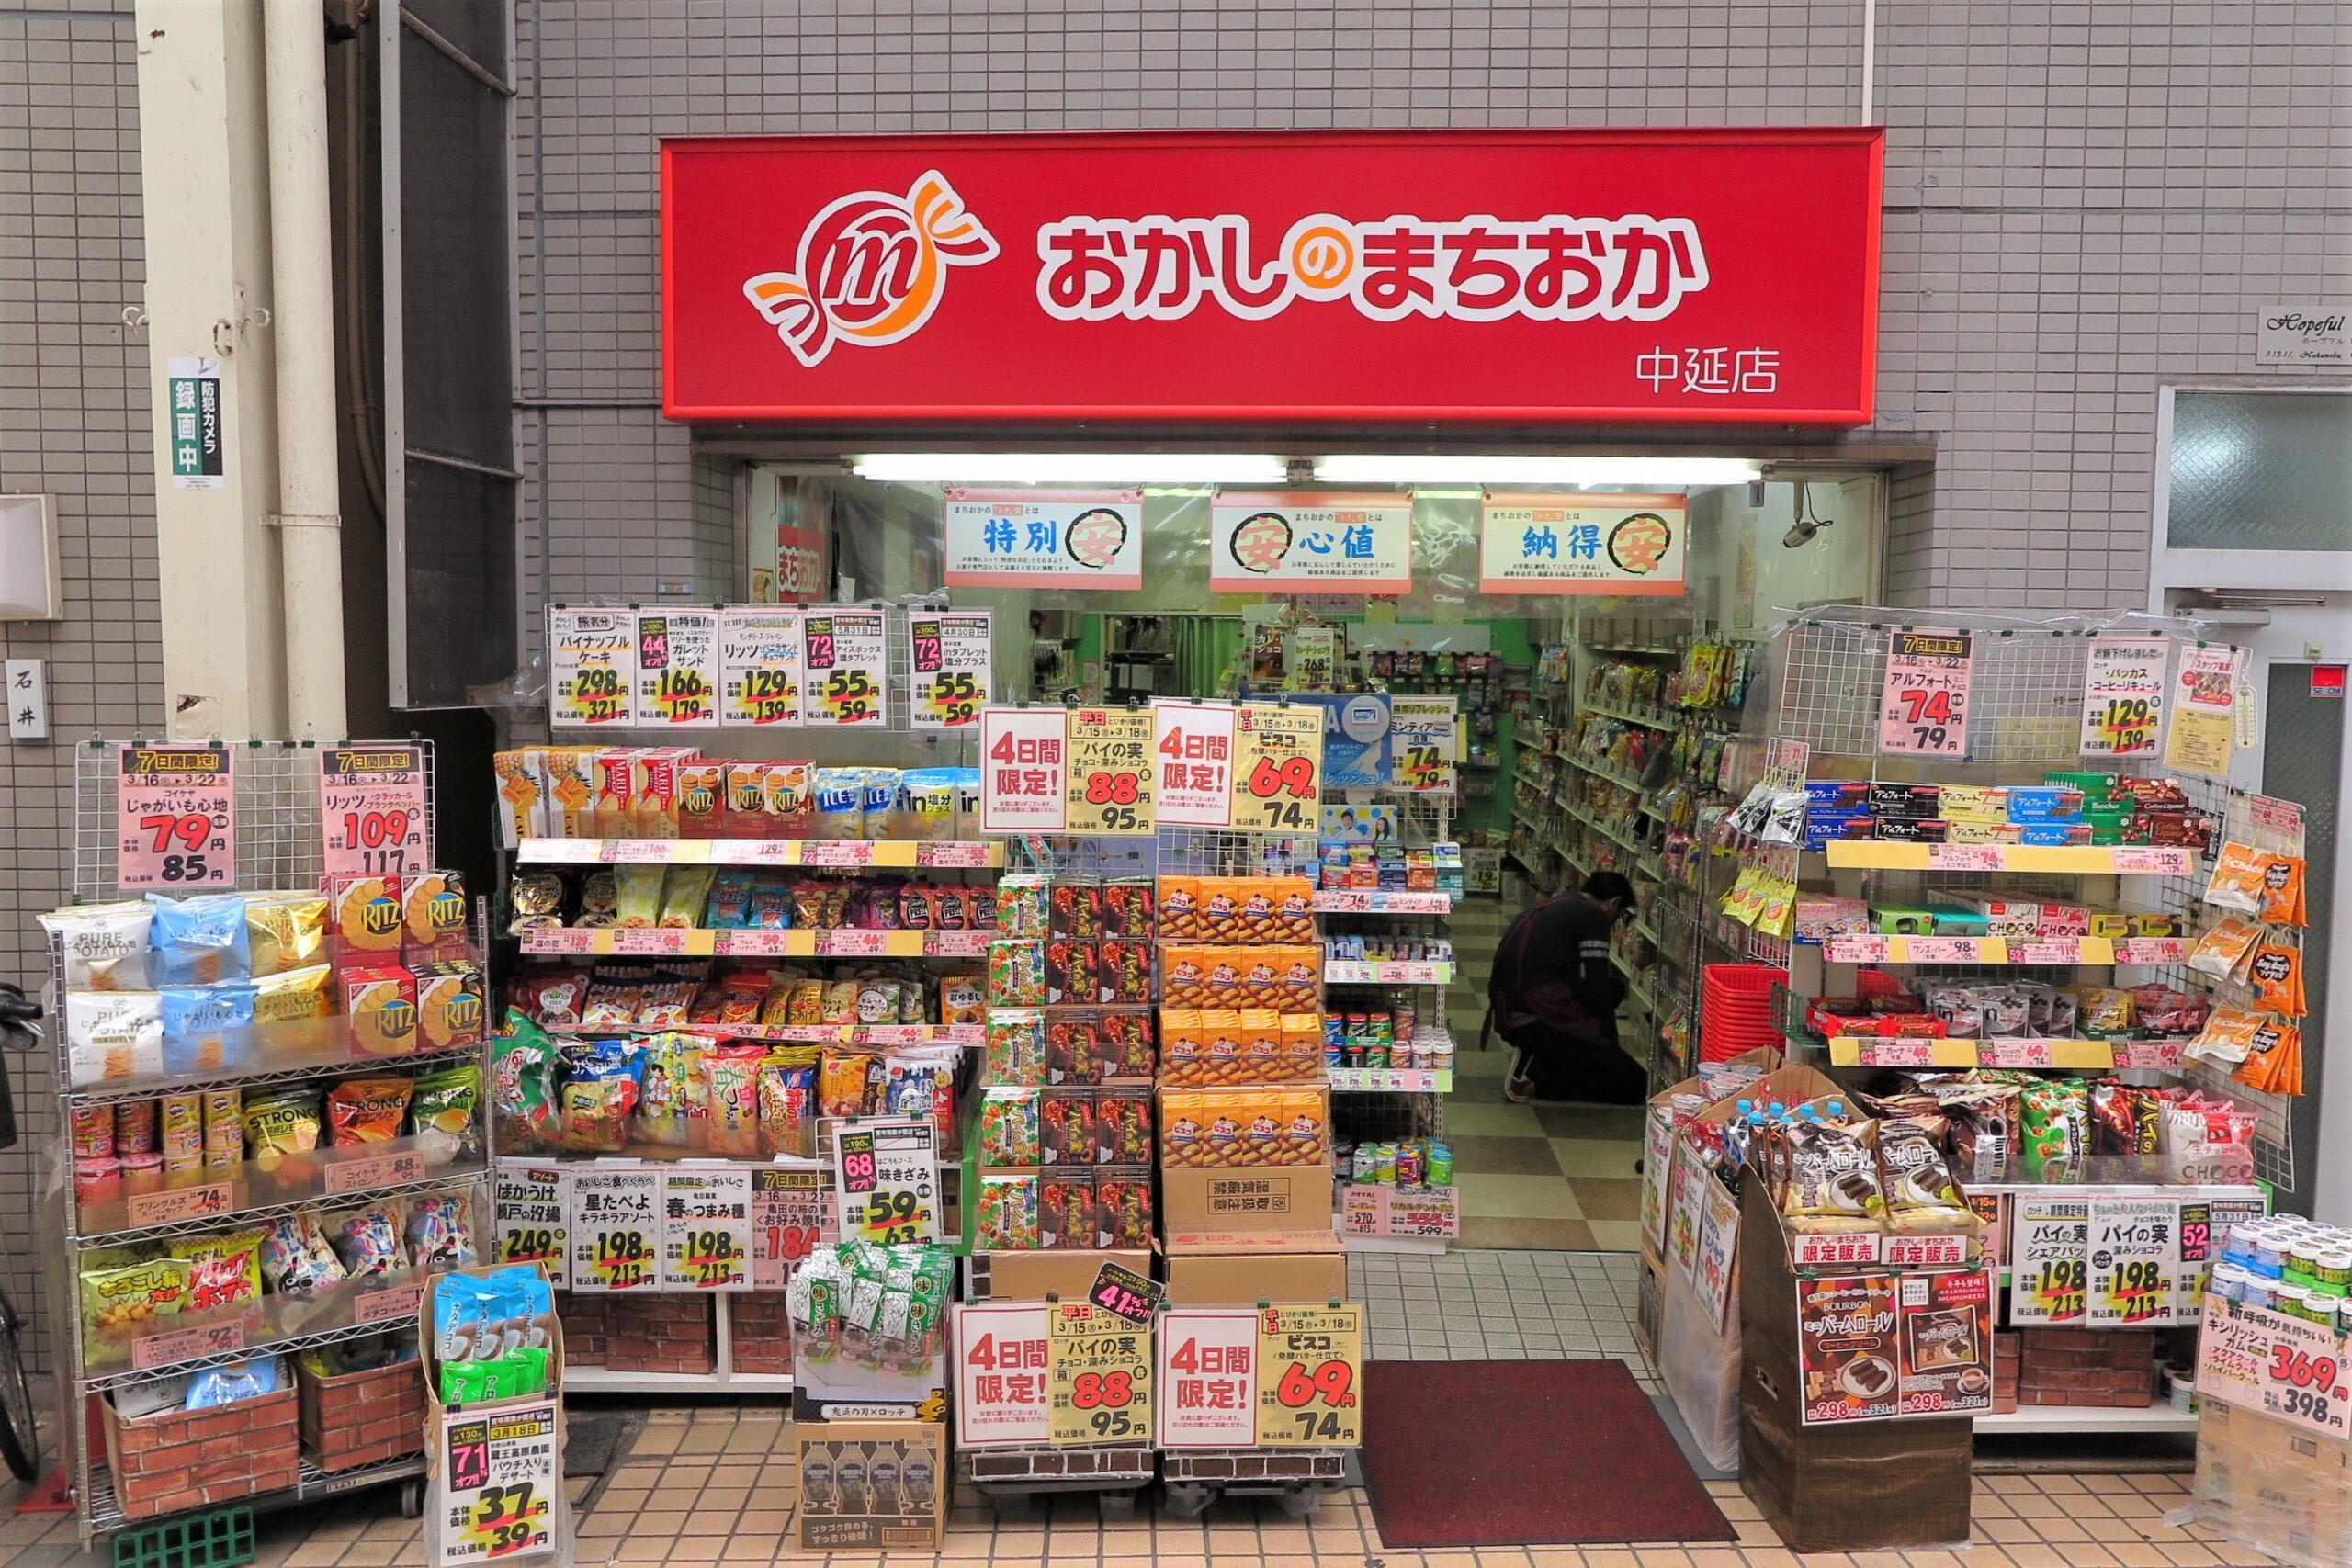 https://nakanobu.com/wp-content/uploads/2021/04/f8b10123d13cc154de60586bc74b89e8-scaled.jpg